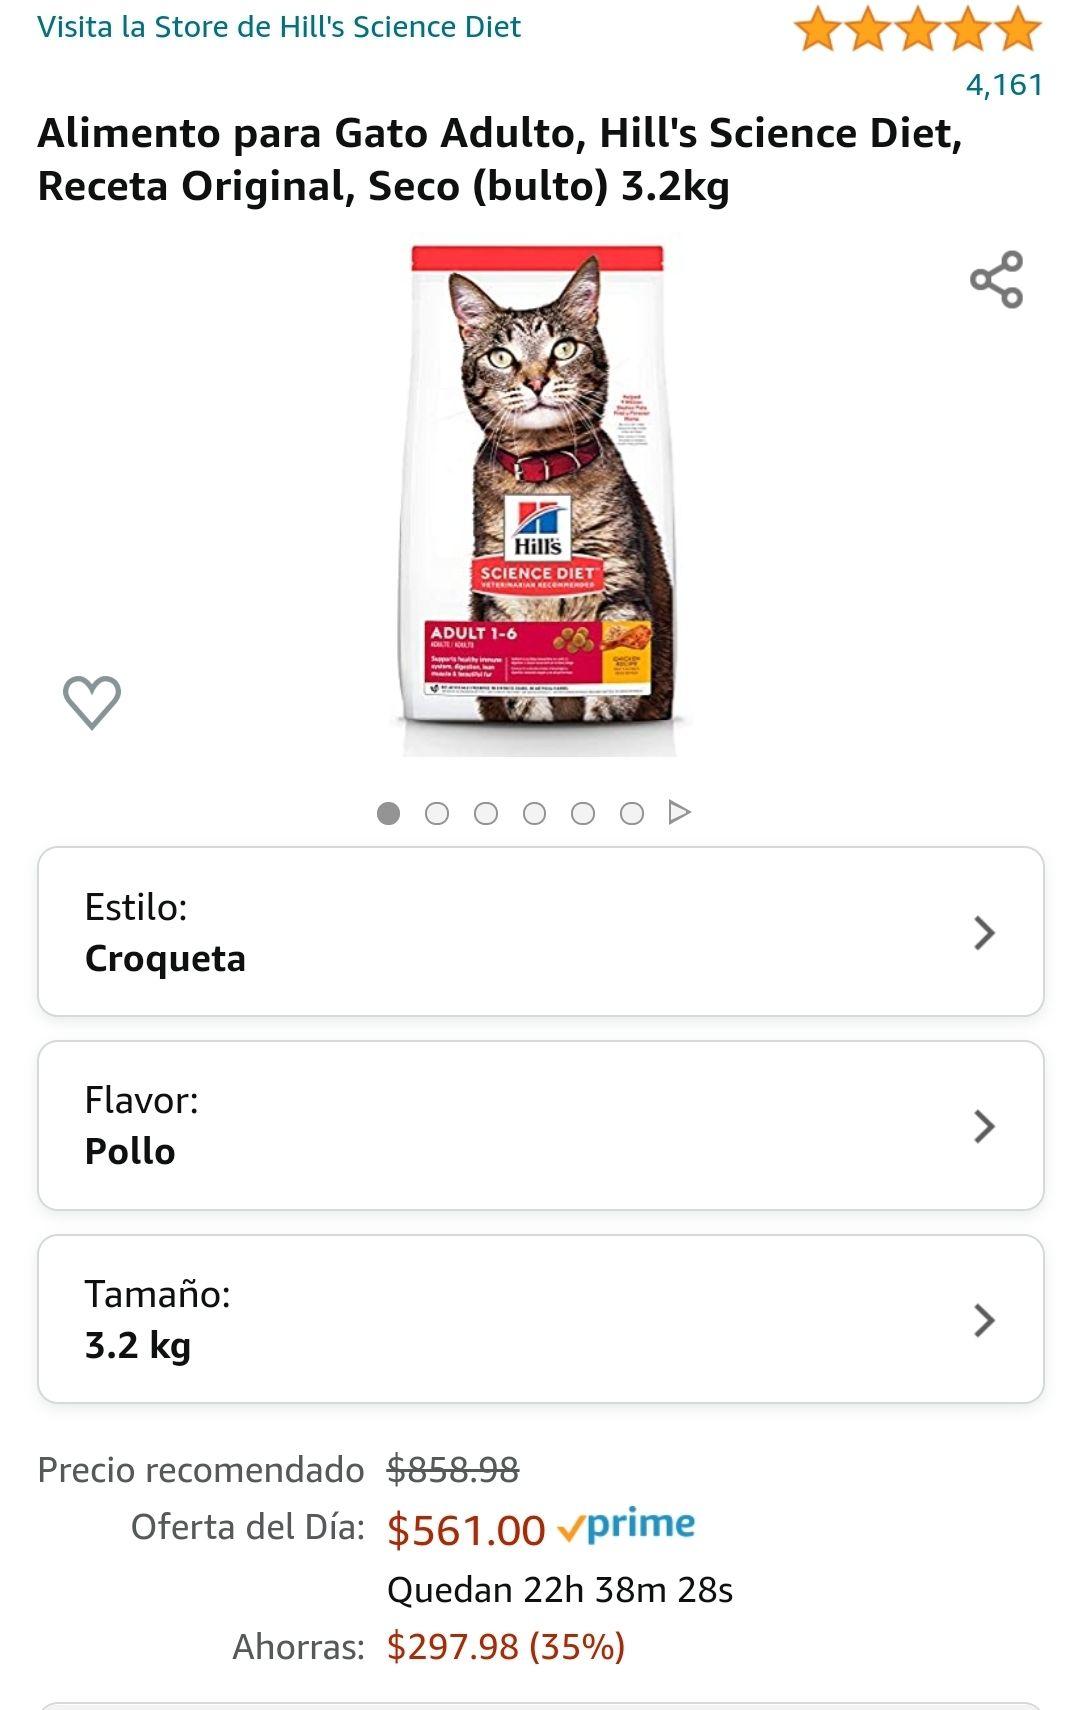 Amazon: Alimento para Gato Adulto, Hill's Science Diet, Receta Original, Seco (bulto) 3.2kg